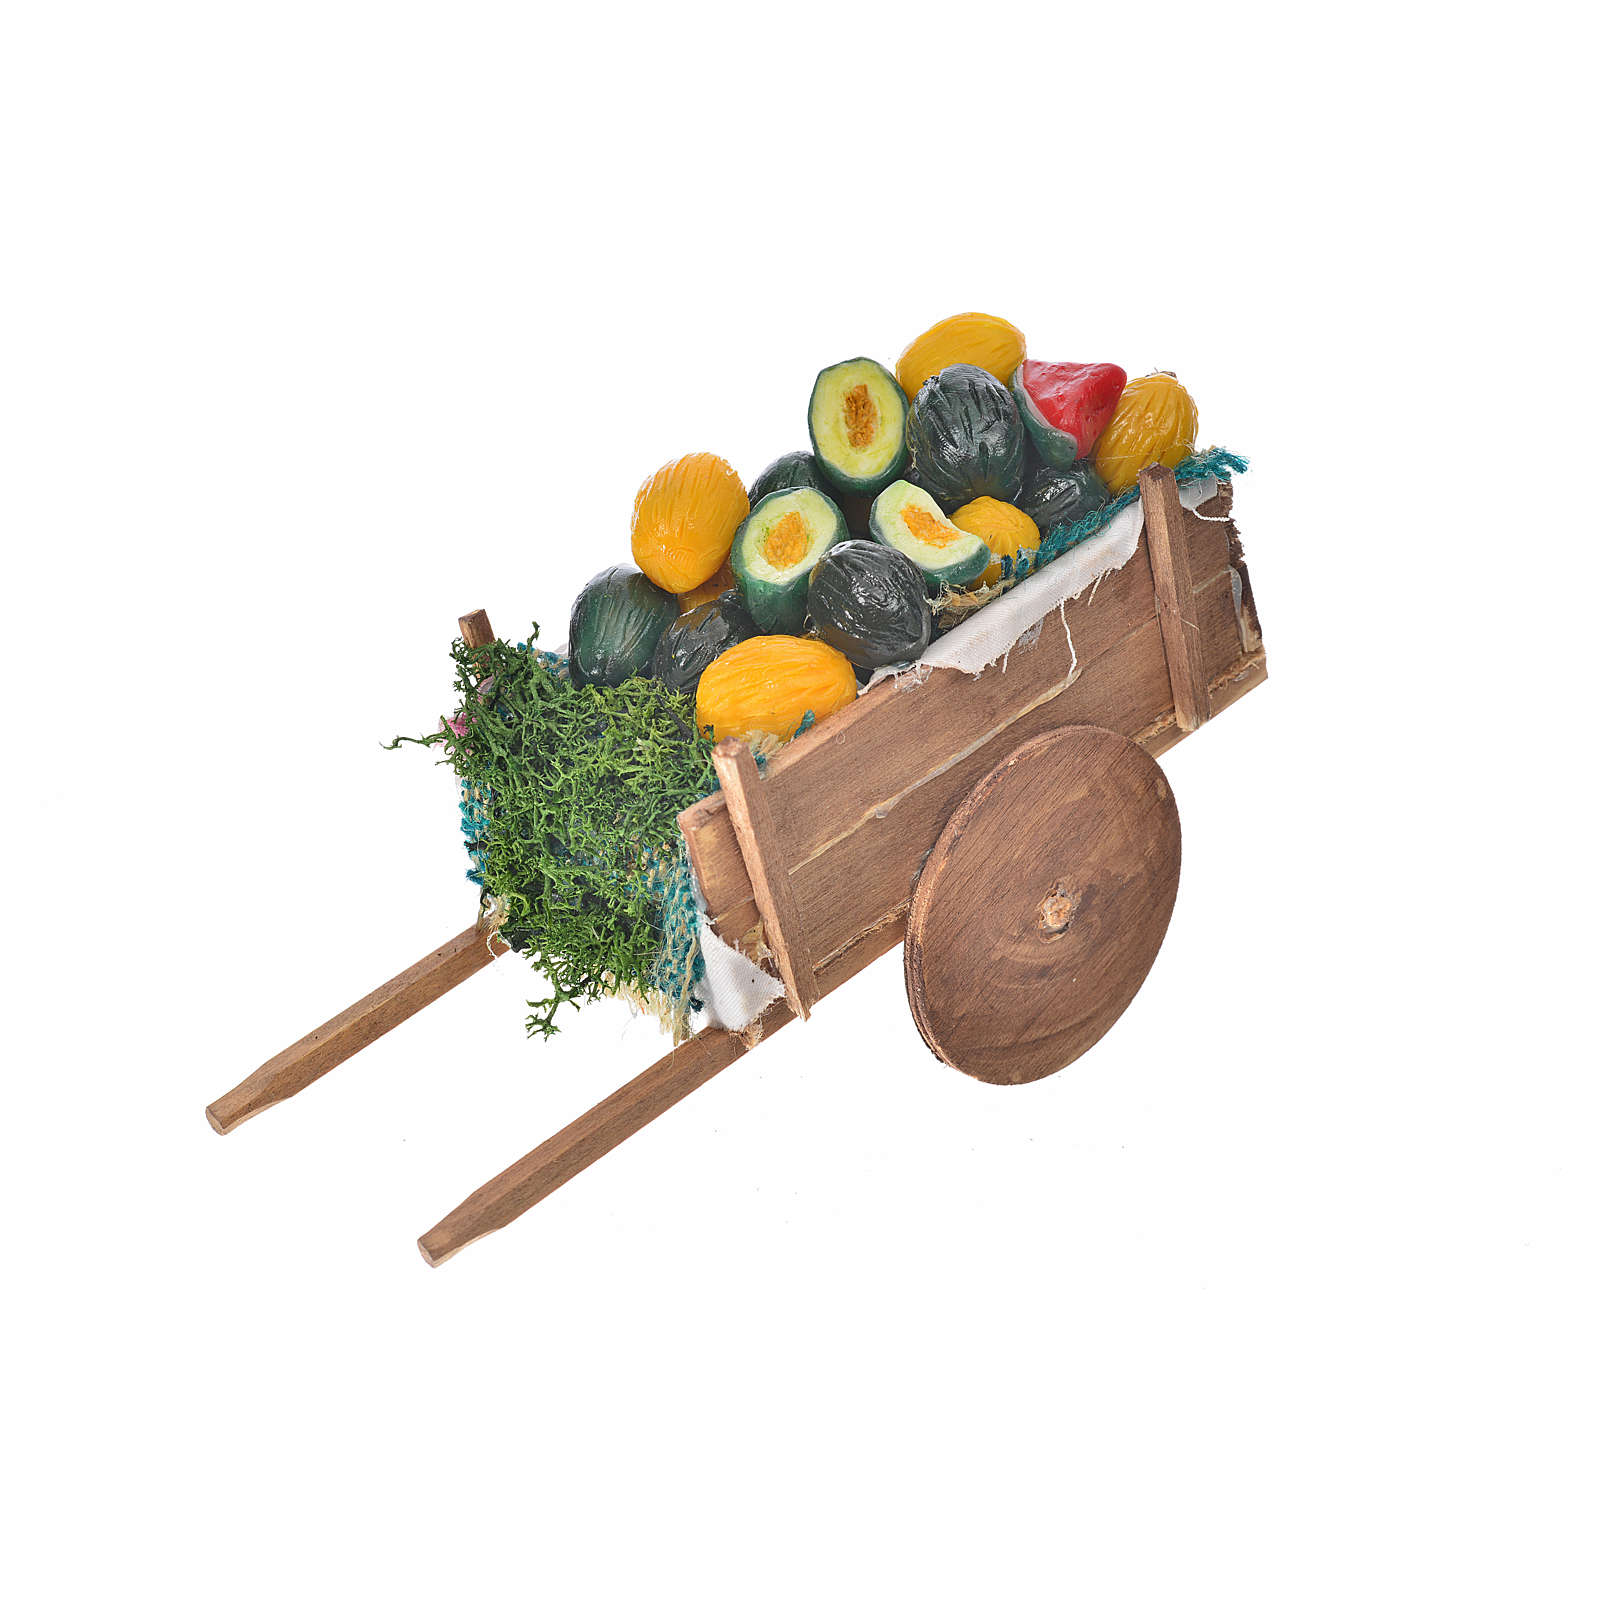 Neapolitan Nativity accessory, melon and watermelon cart in wax 4